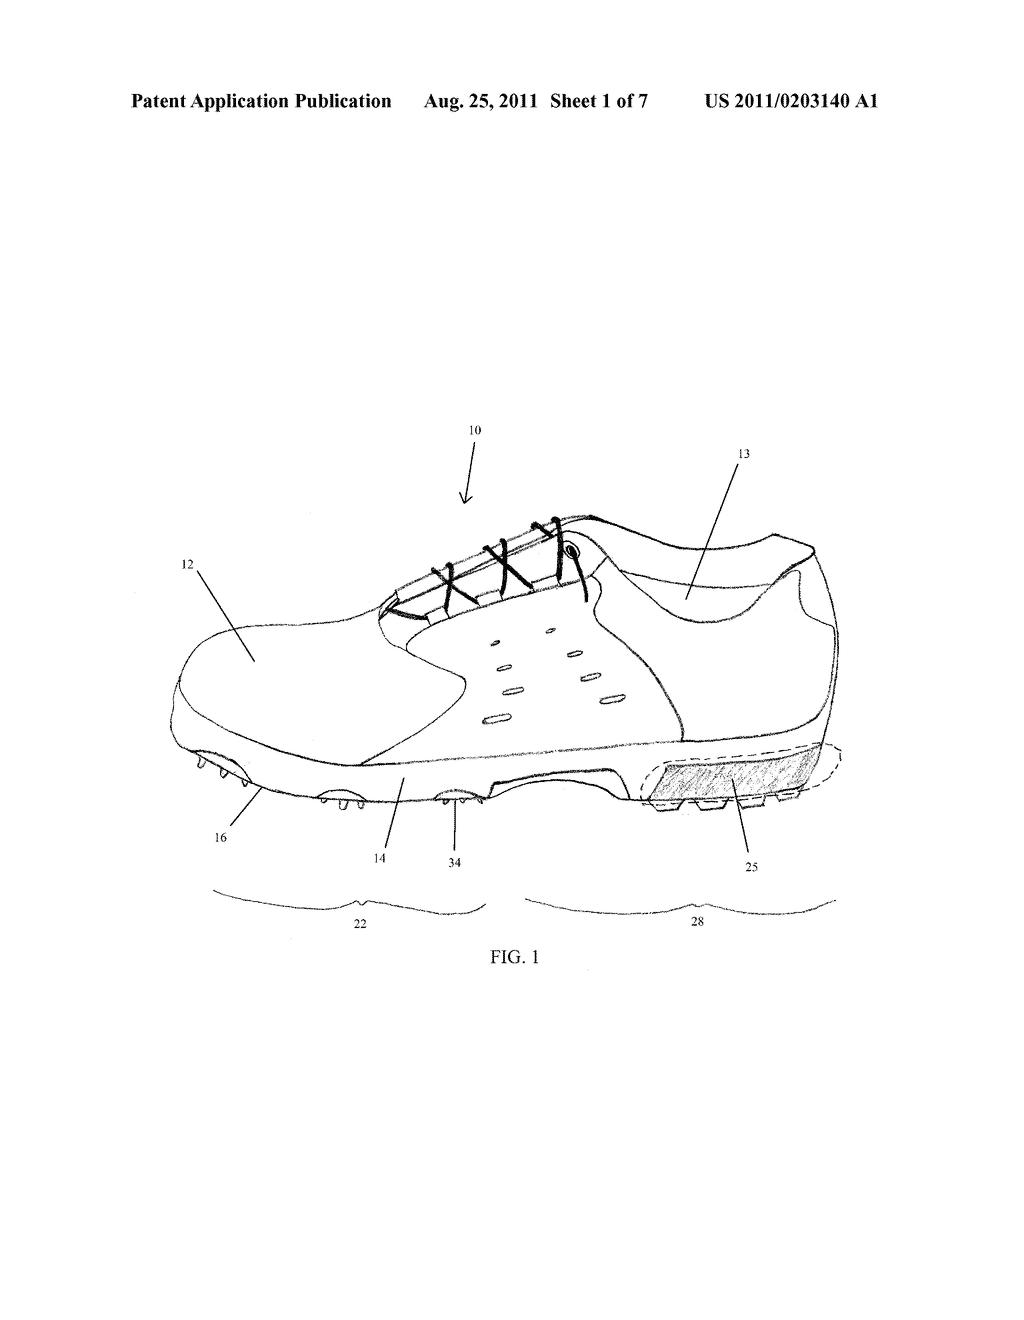 golf shoe diagram schematic and image 02 rh patentsencyclopedia com diagram of shoe rack diagram of shoe rack